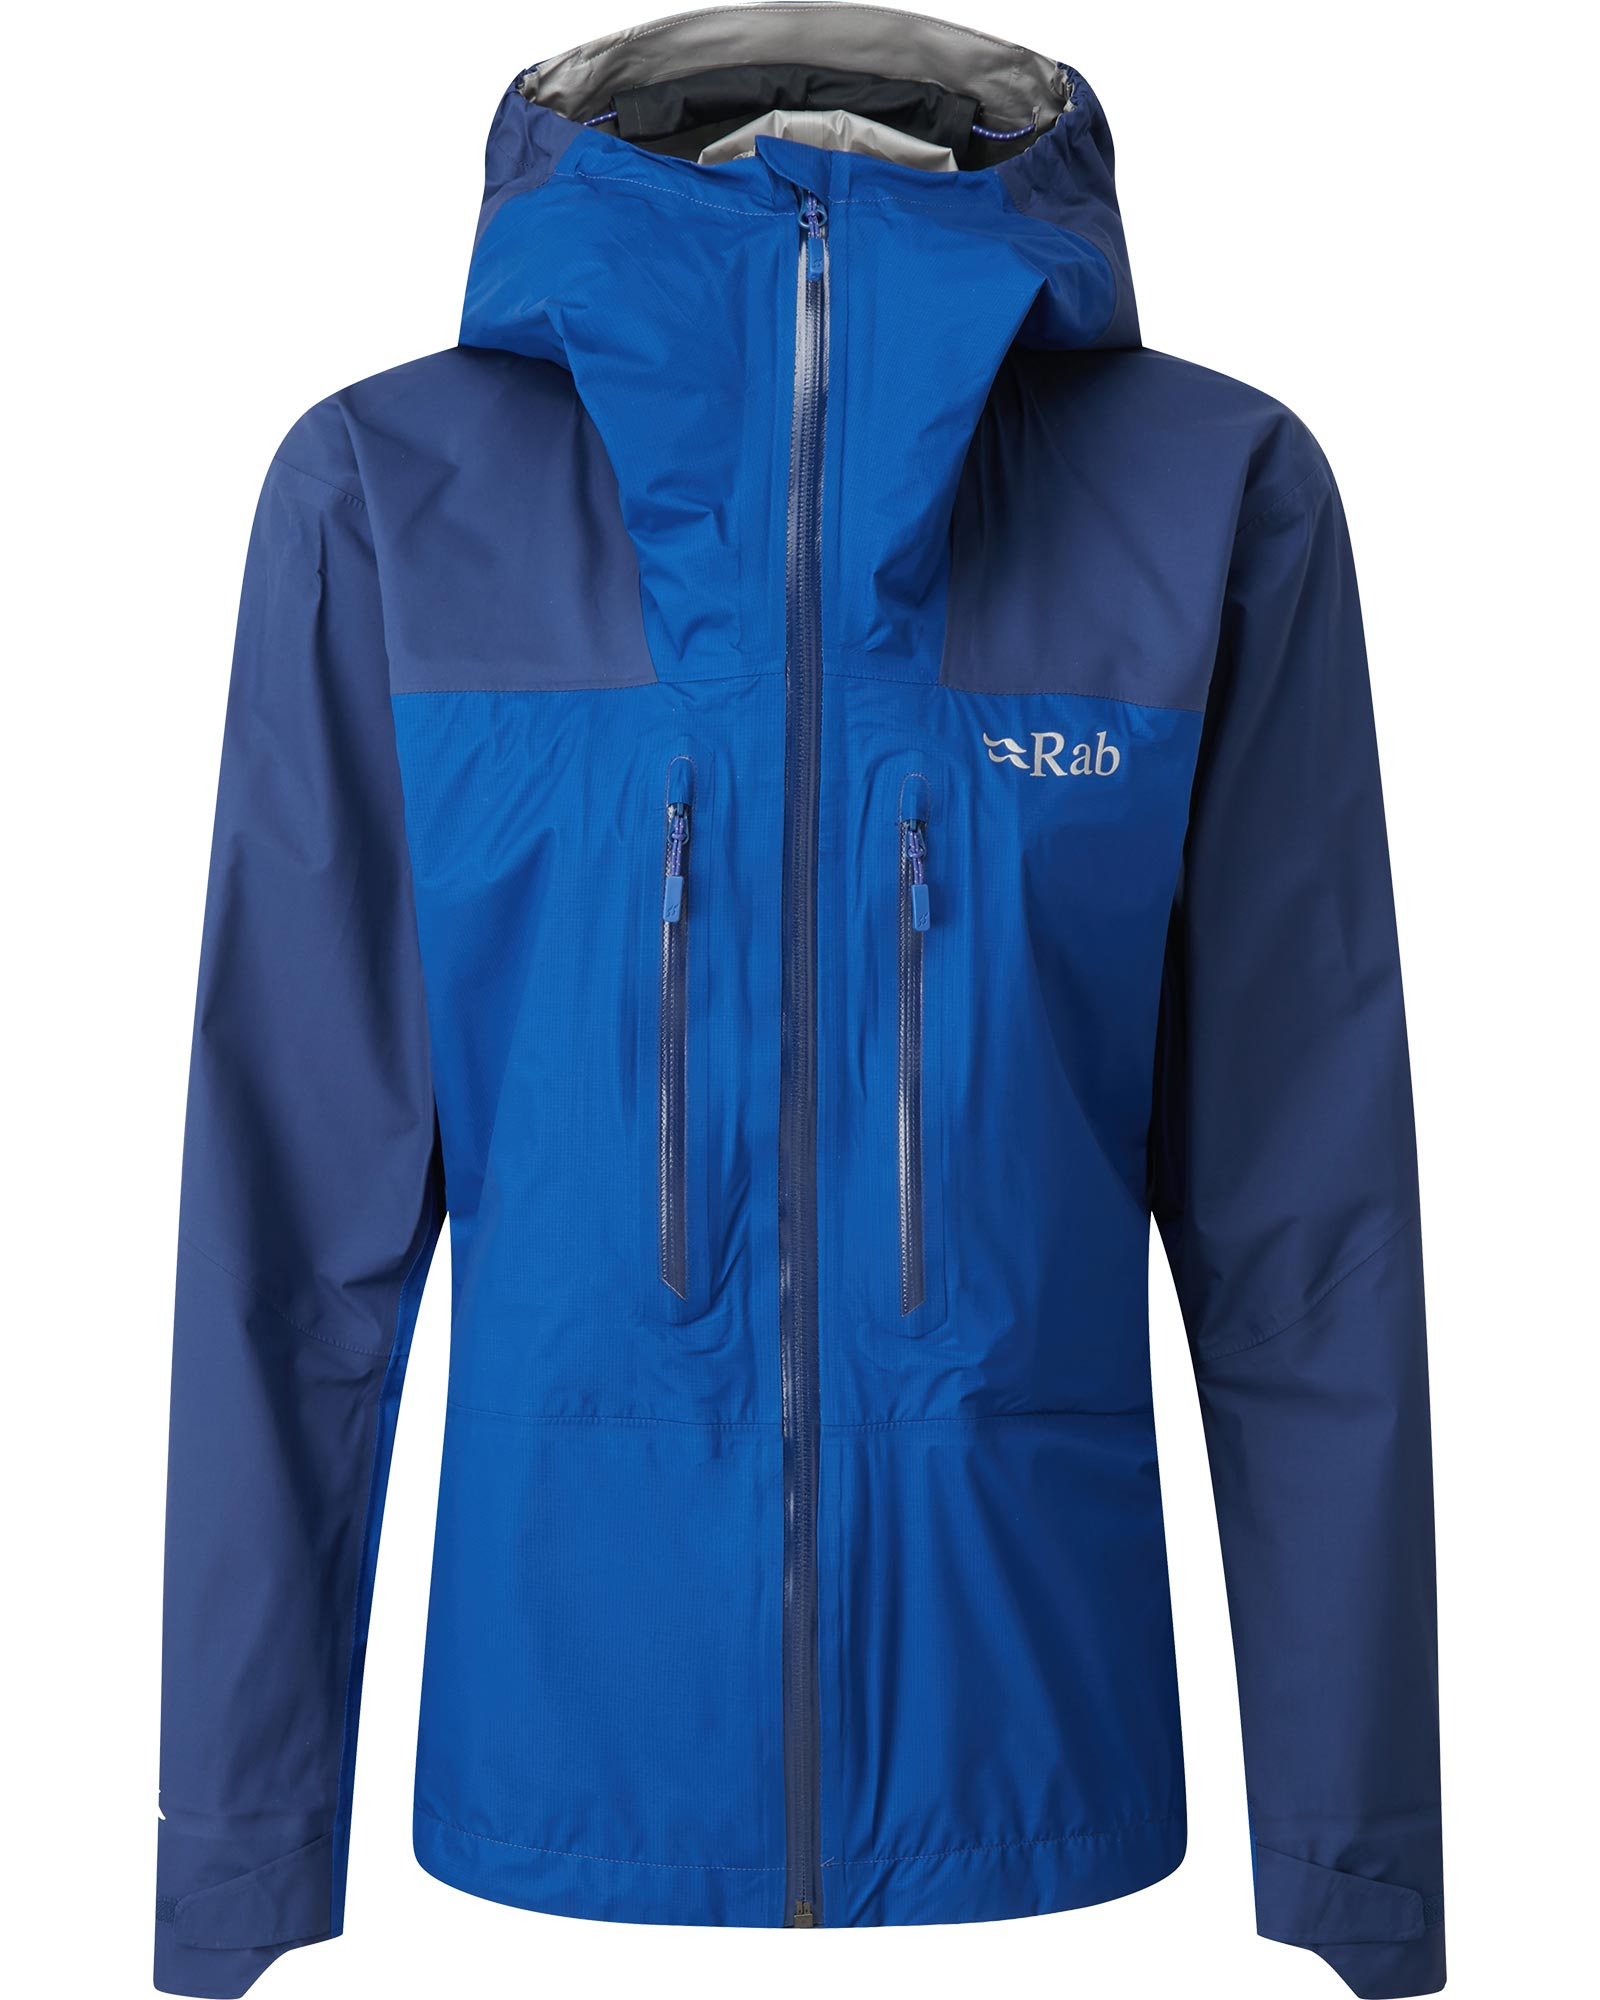 Rab Womens Microlight Alpine Jacket